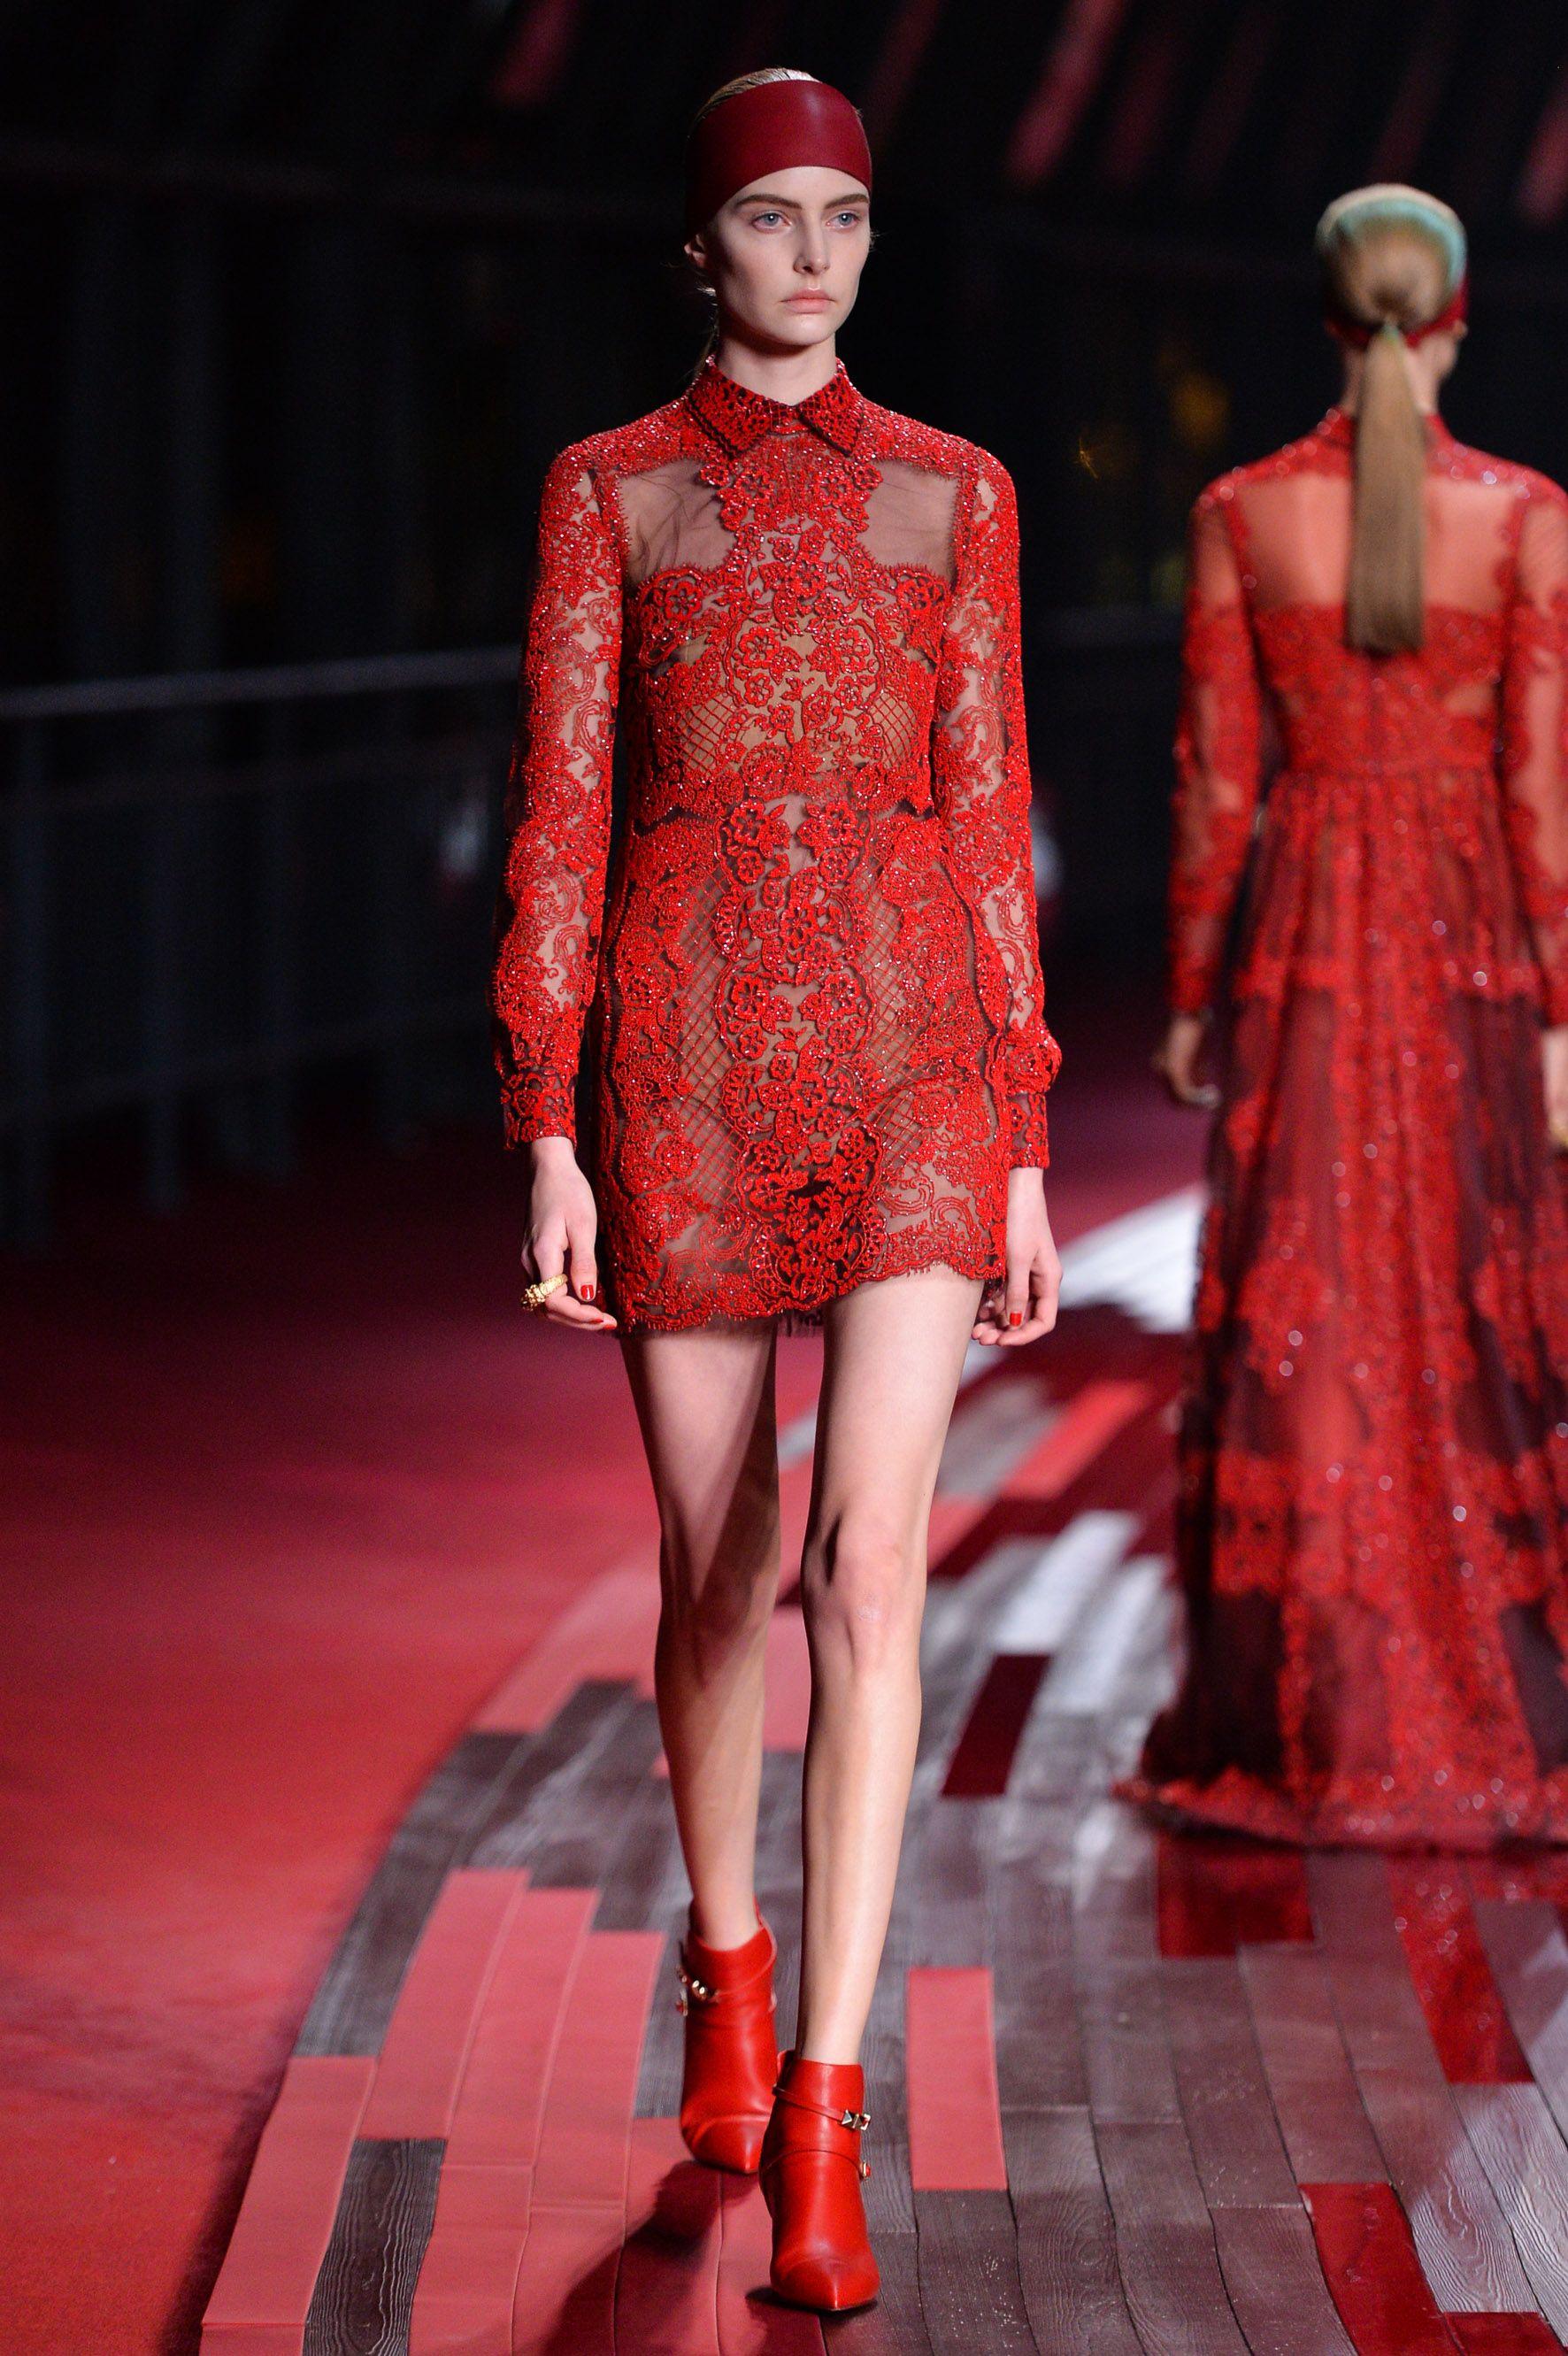 #Valentino #Shangai #collection2013 #womensfashion #fashion #dresses #designers #outfit #style #closetonthego